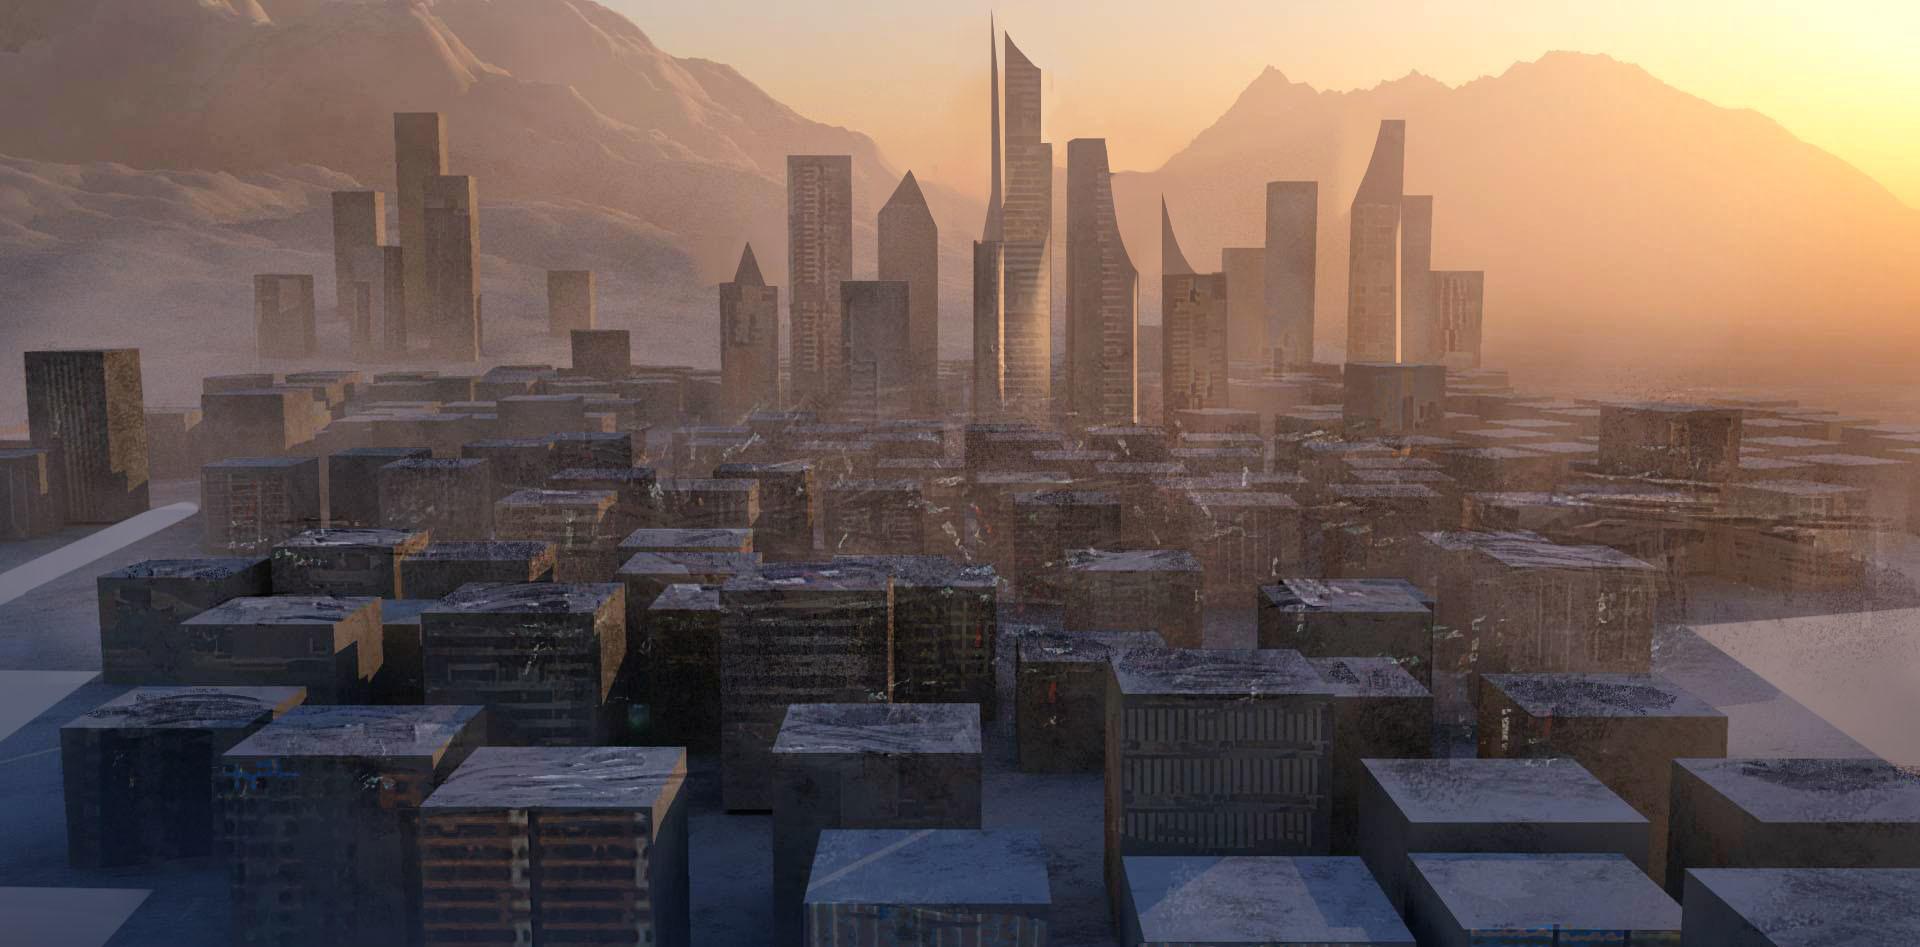 godwin akpan dystopian city